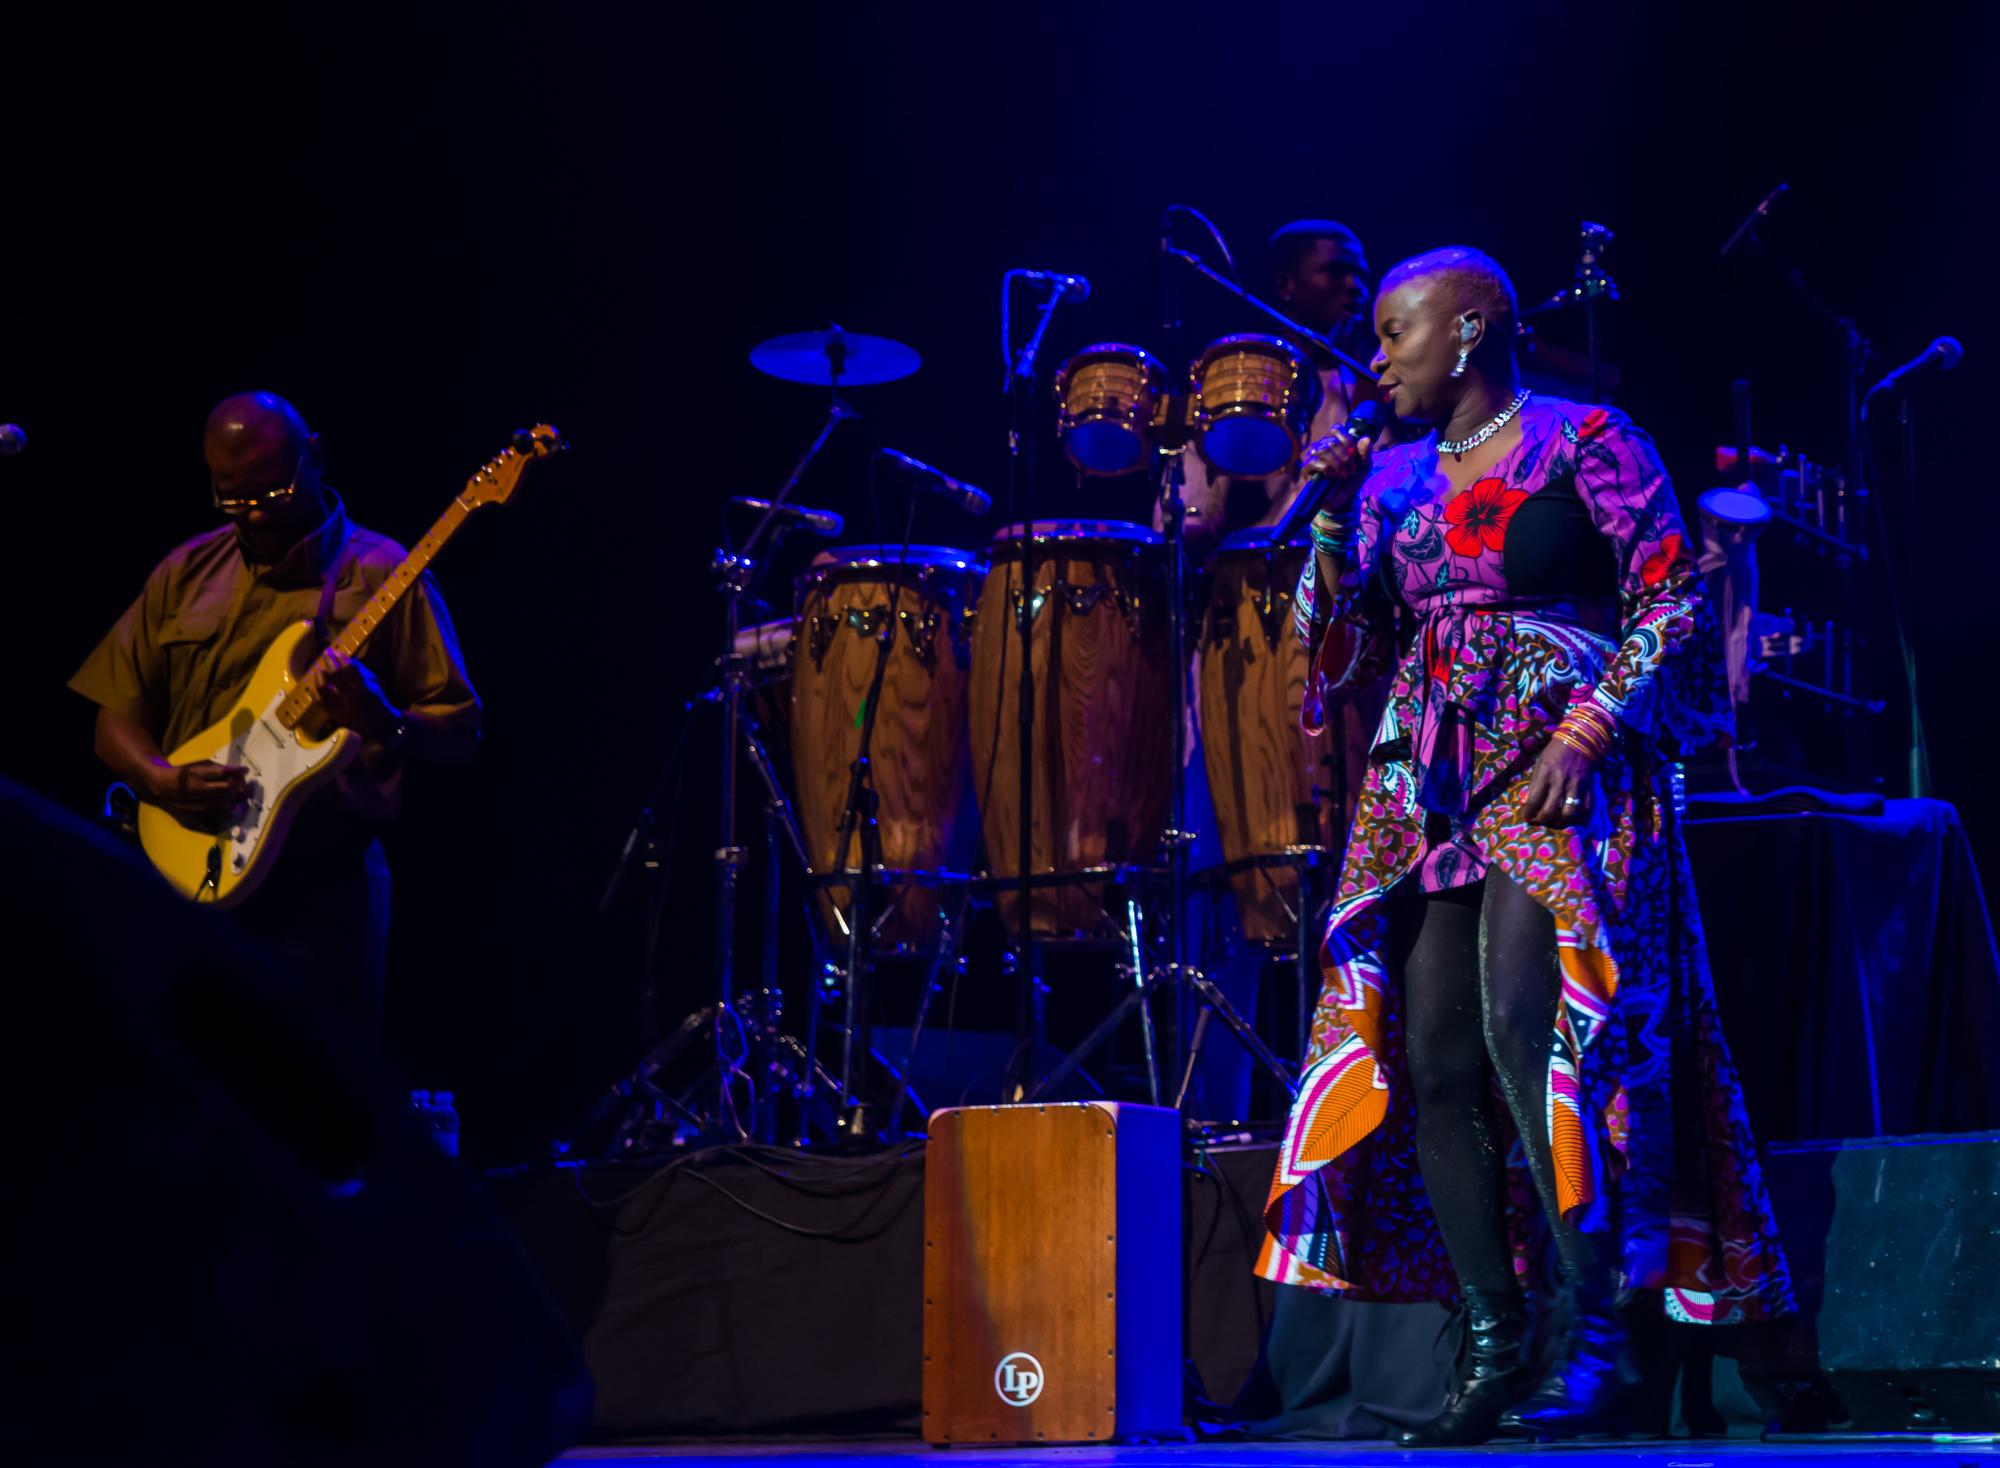 Royal Festival Hall, UK. 14th November 2014. Angelique Kidjo performing at Royal Festival Hall